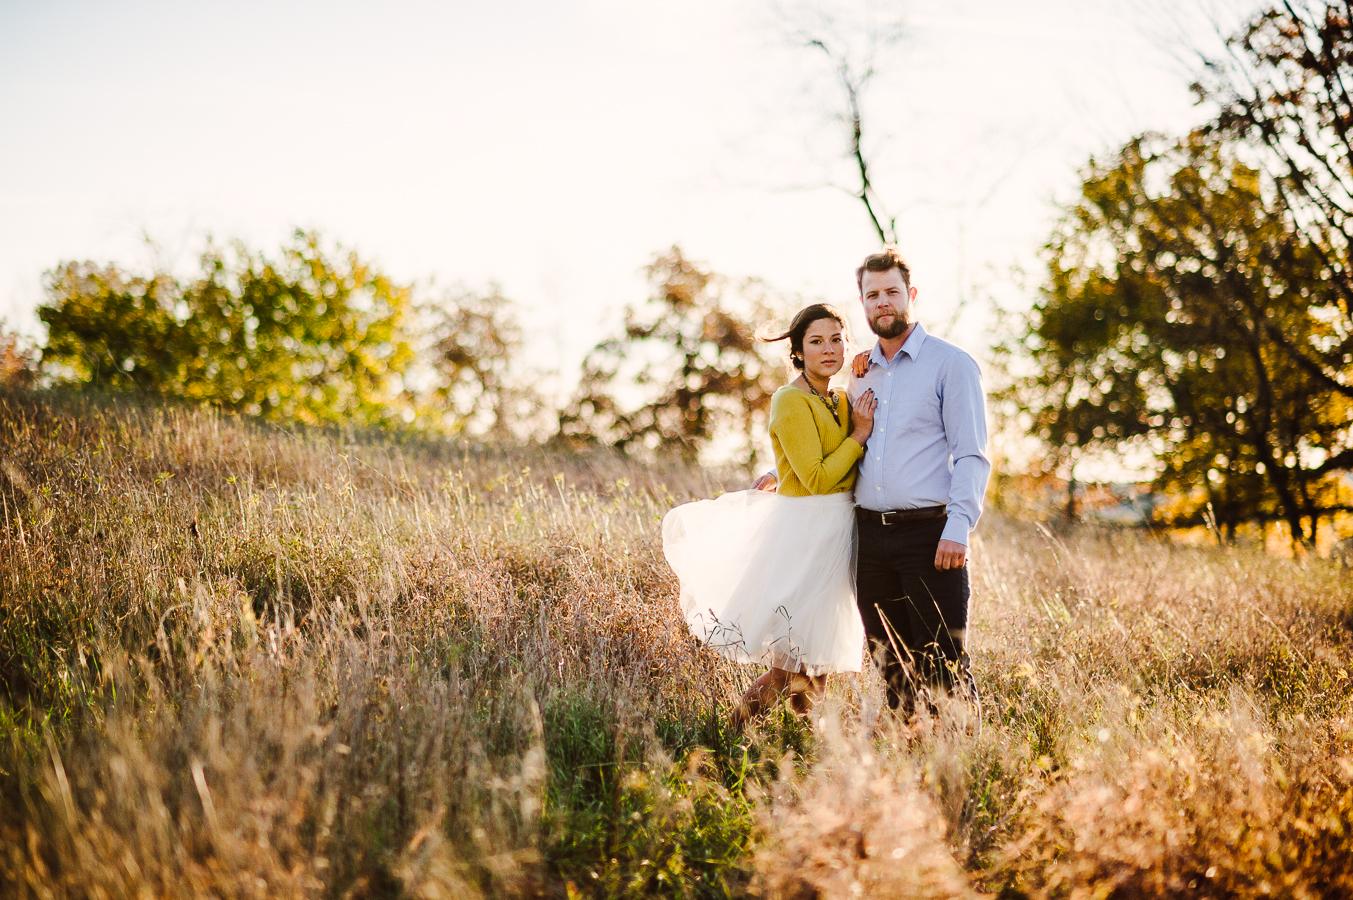 Rodale Farm Institute Wedding Photographer Trexler Nature Preserve Engagement Shoot Alexandra Grecco Tulle Skirt Philadelphia Weddings Longbrook Photography-34.jpg